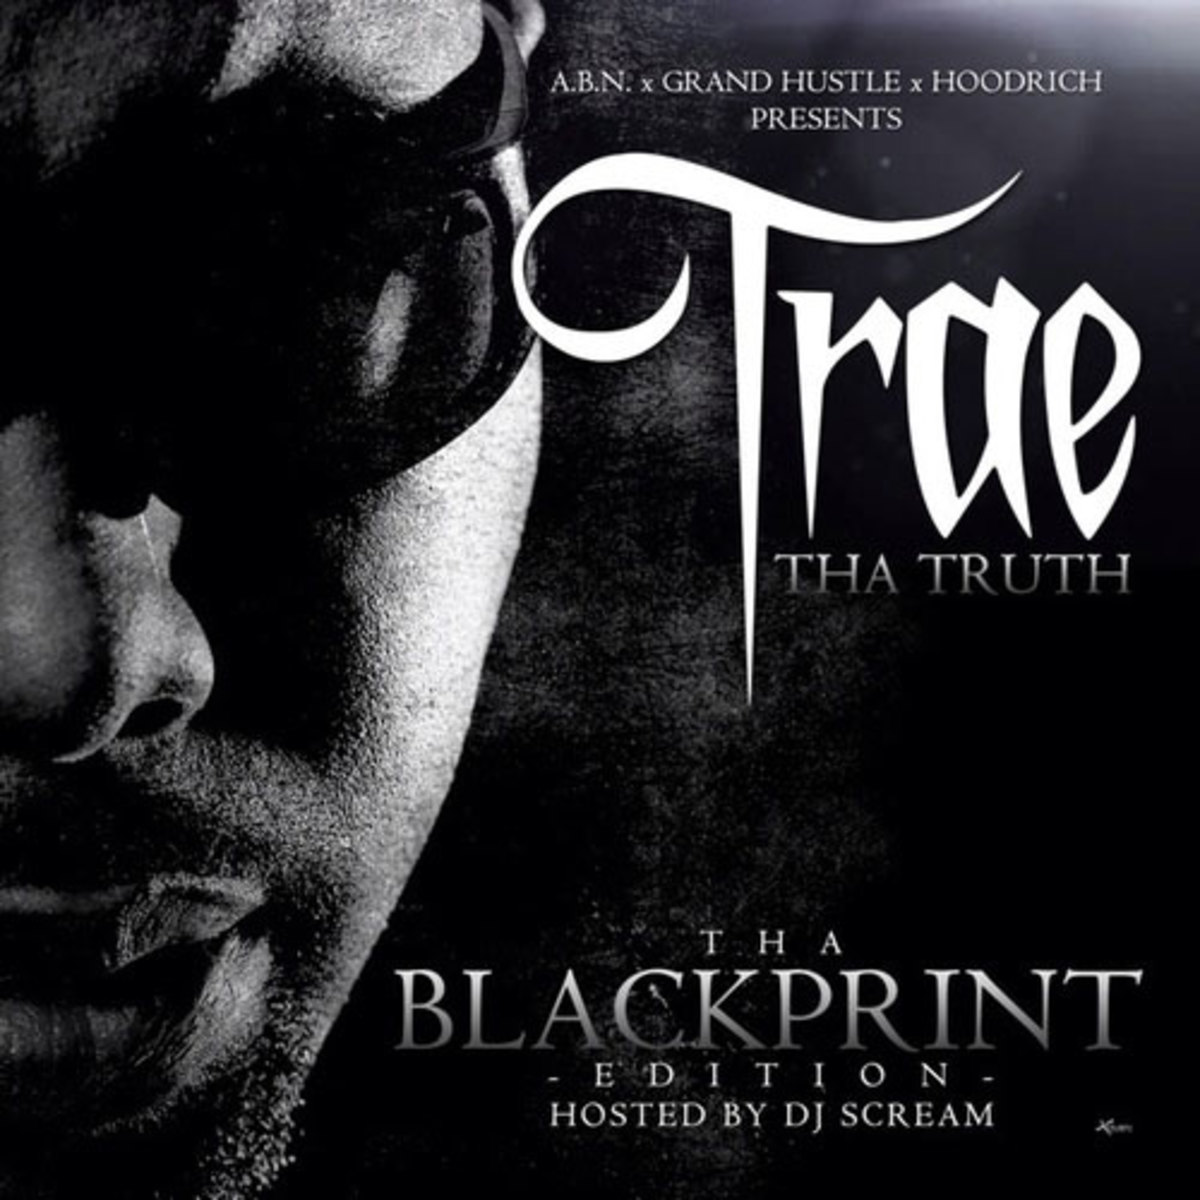 trae-thablackprint.jpg